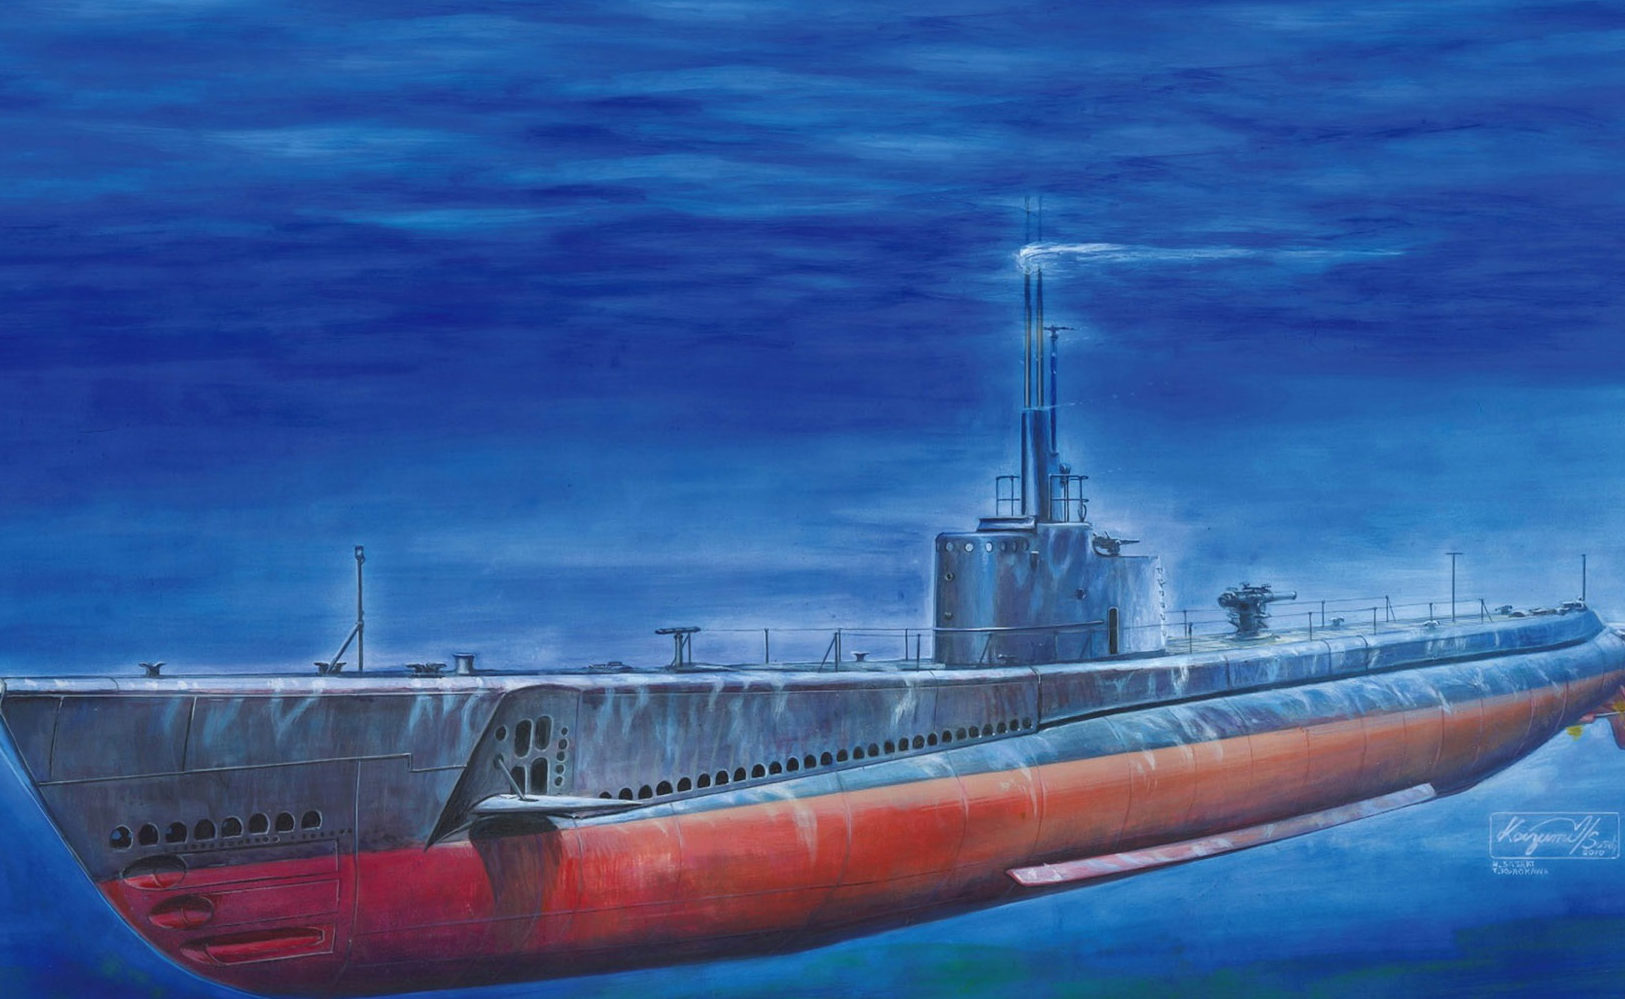 Sasaki H. & Kurokawa T. Подлодка класса Gato.